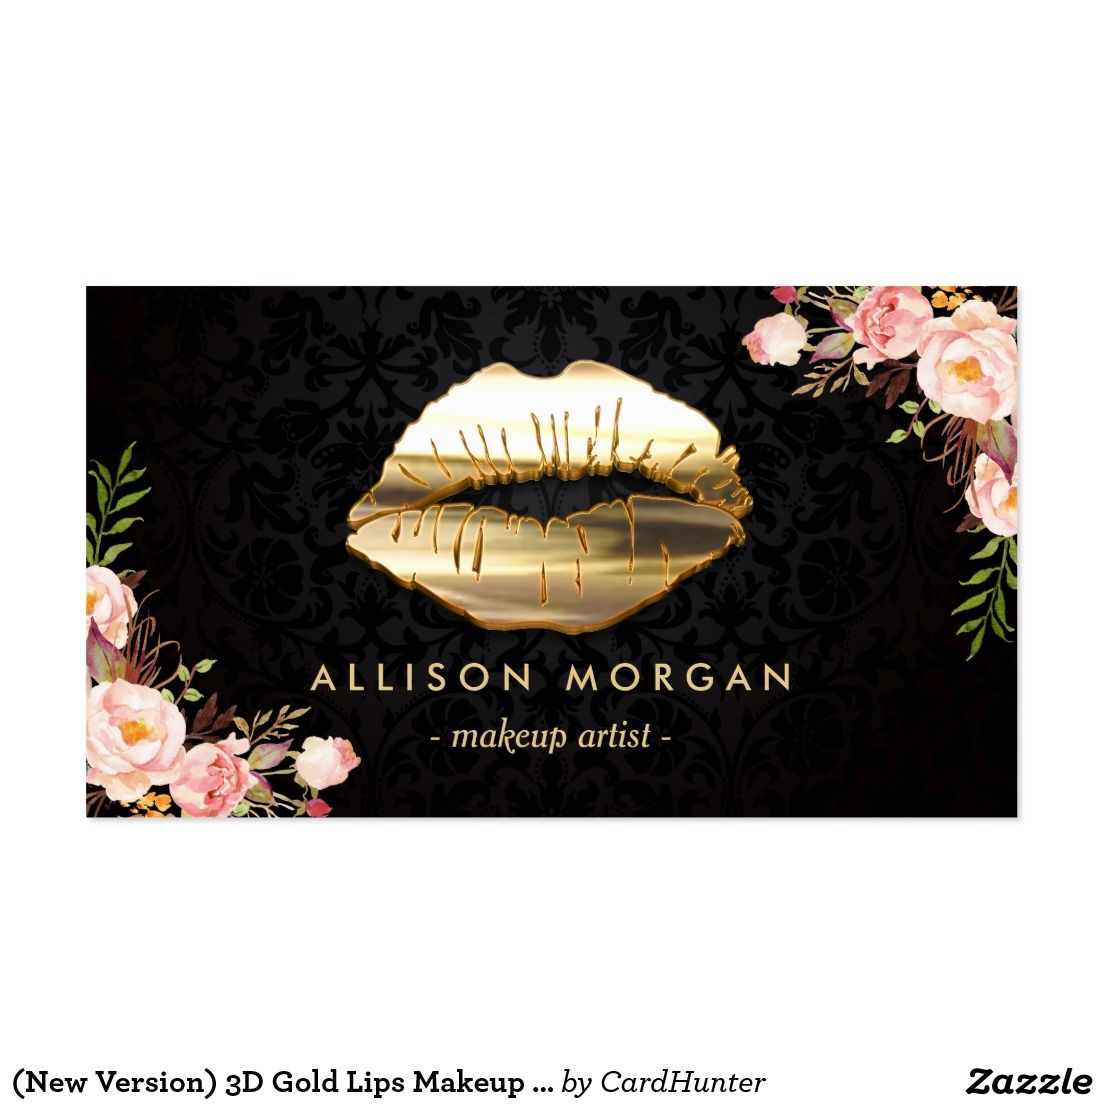 New Version) 3D Gold Lips Makeup Artist Floral Business Card ...